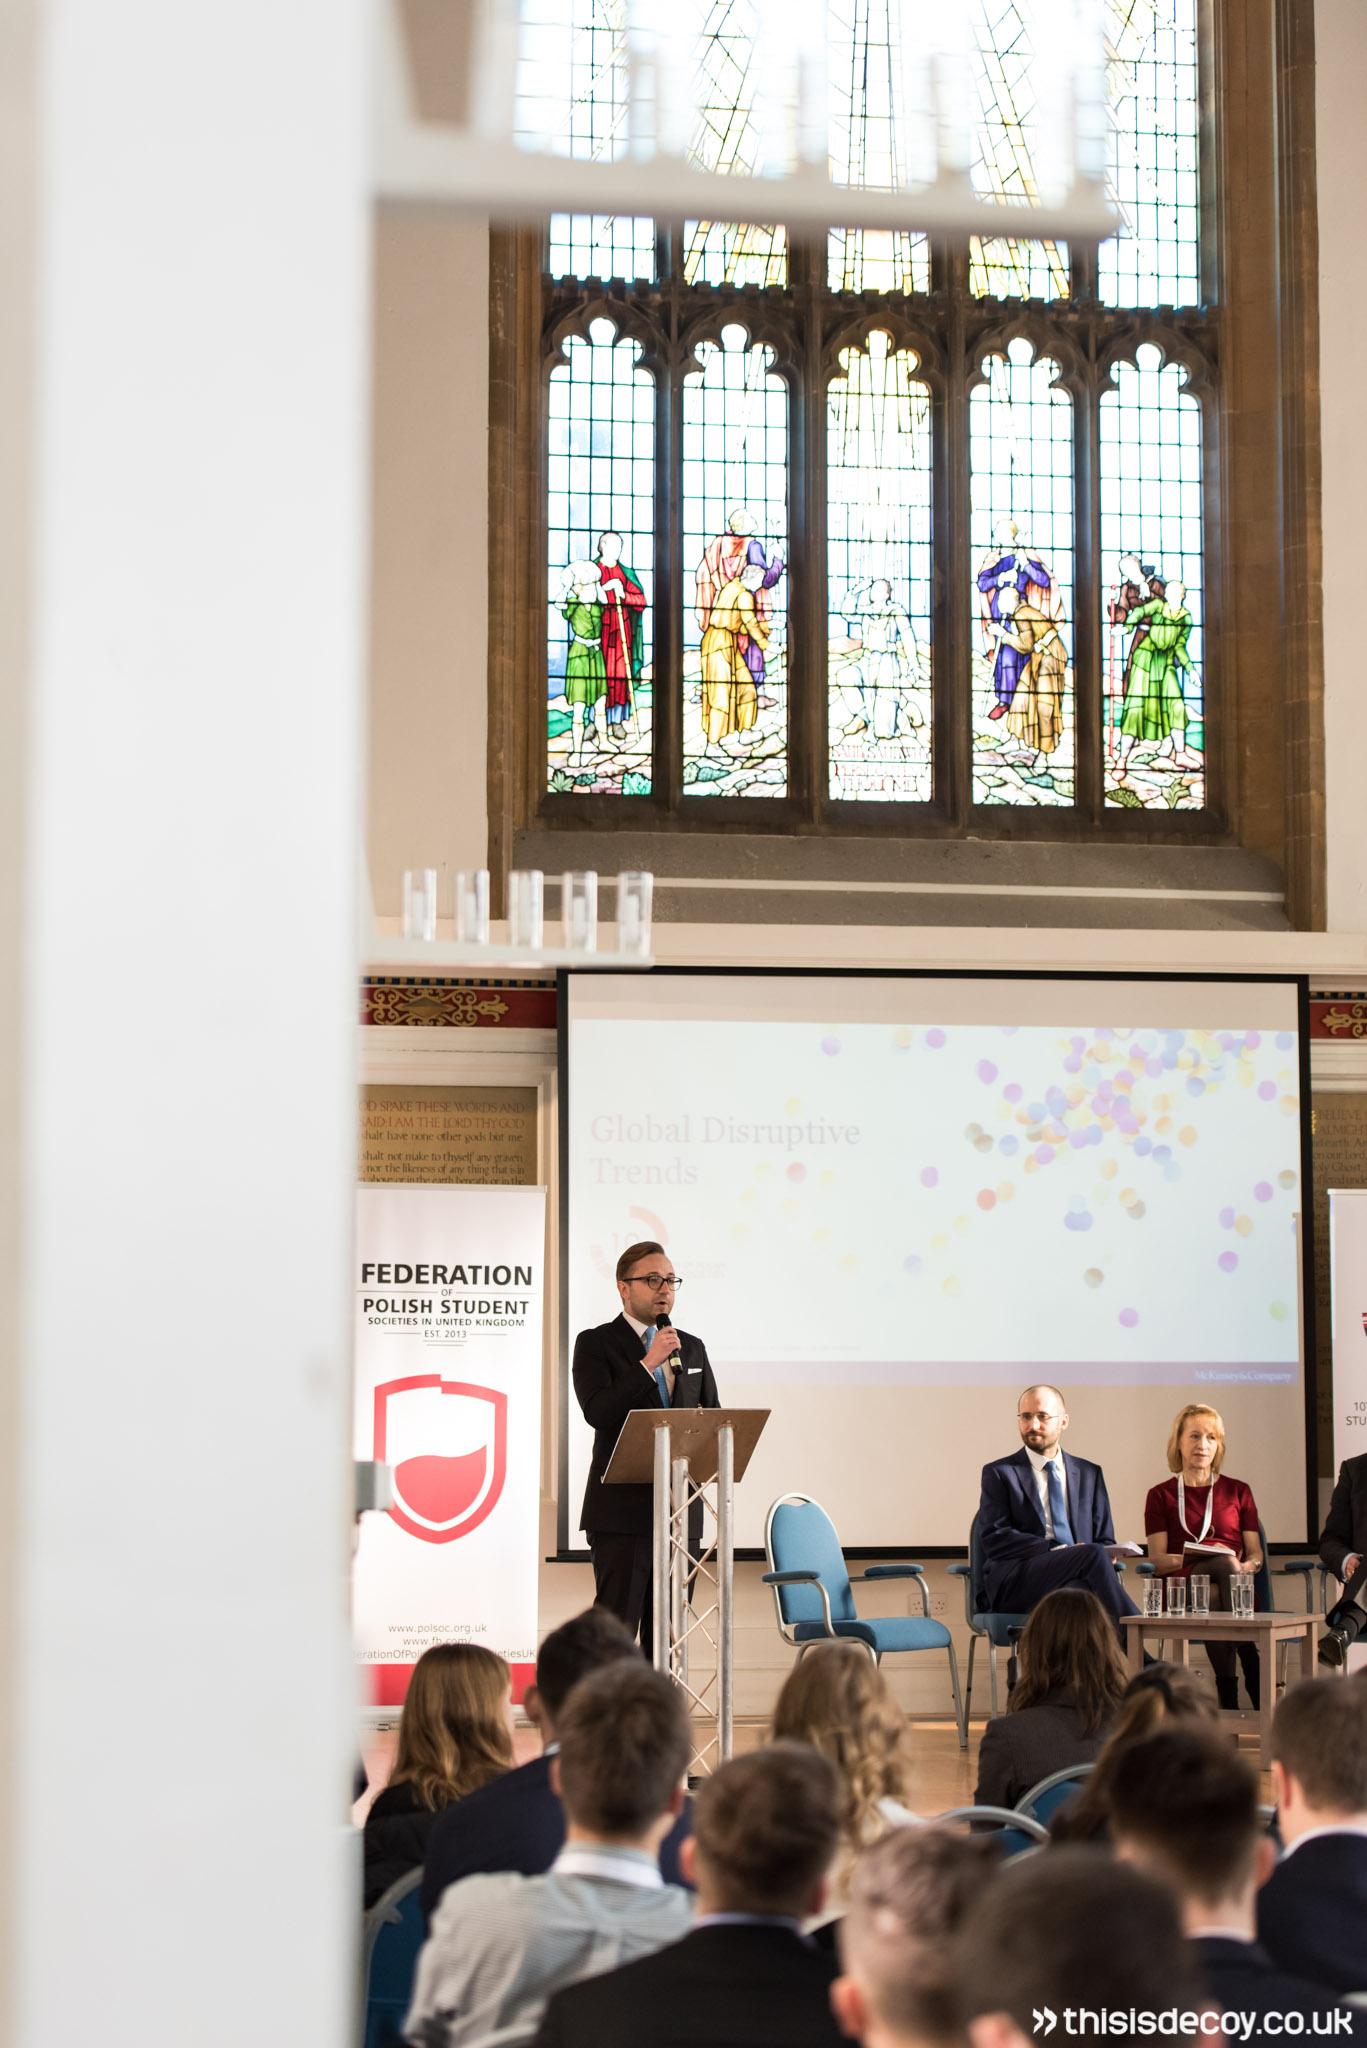 Polish Congress of Student Societies in the UK 2017 - Decoy Media - 14.jpg